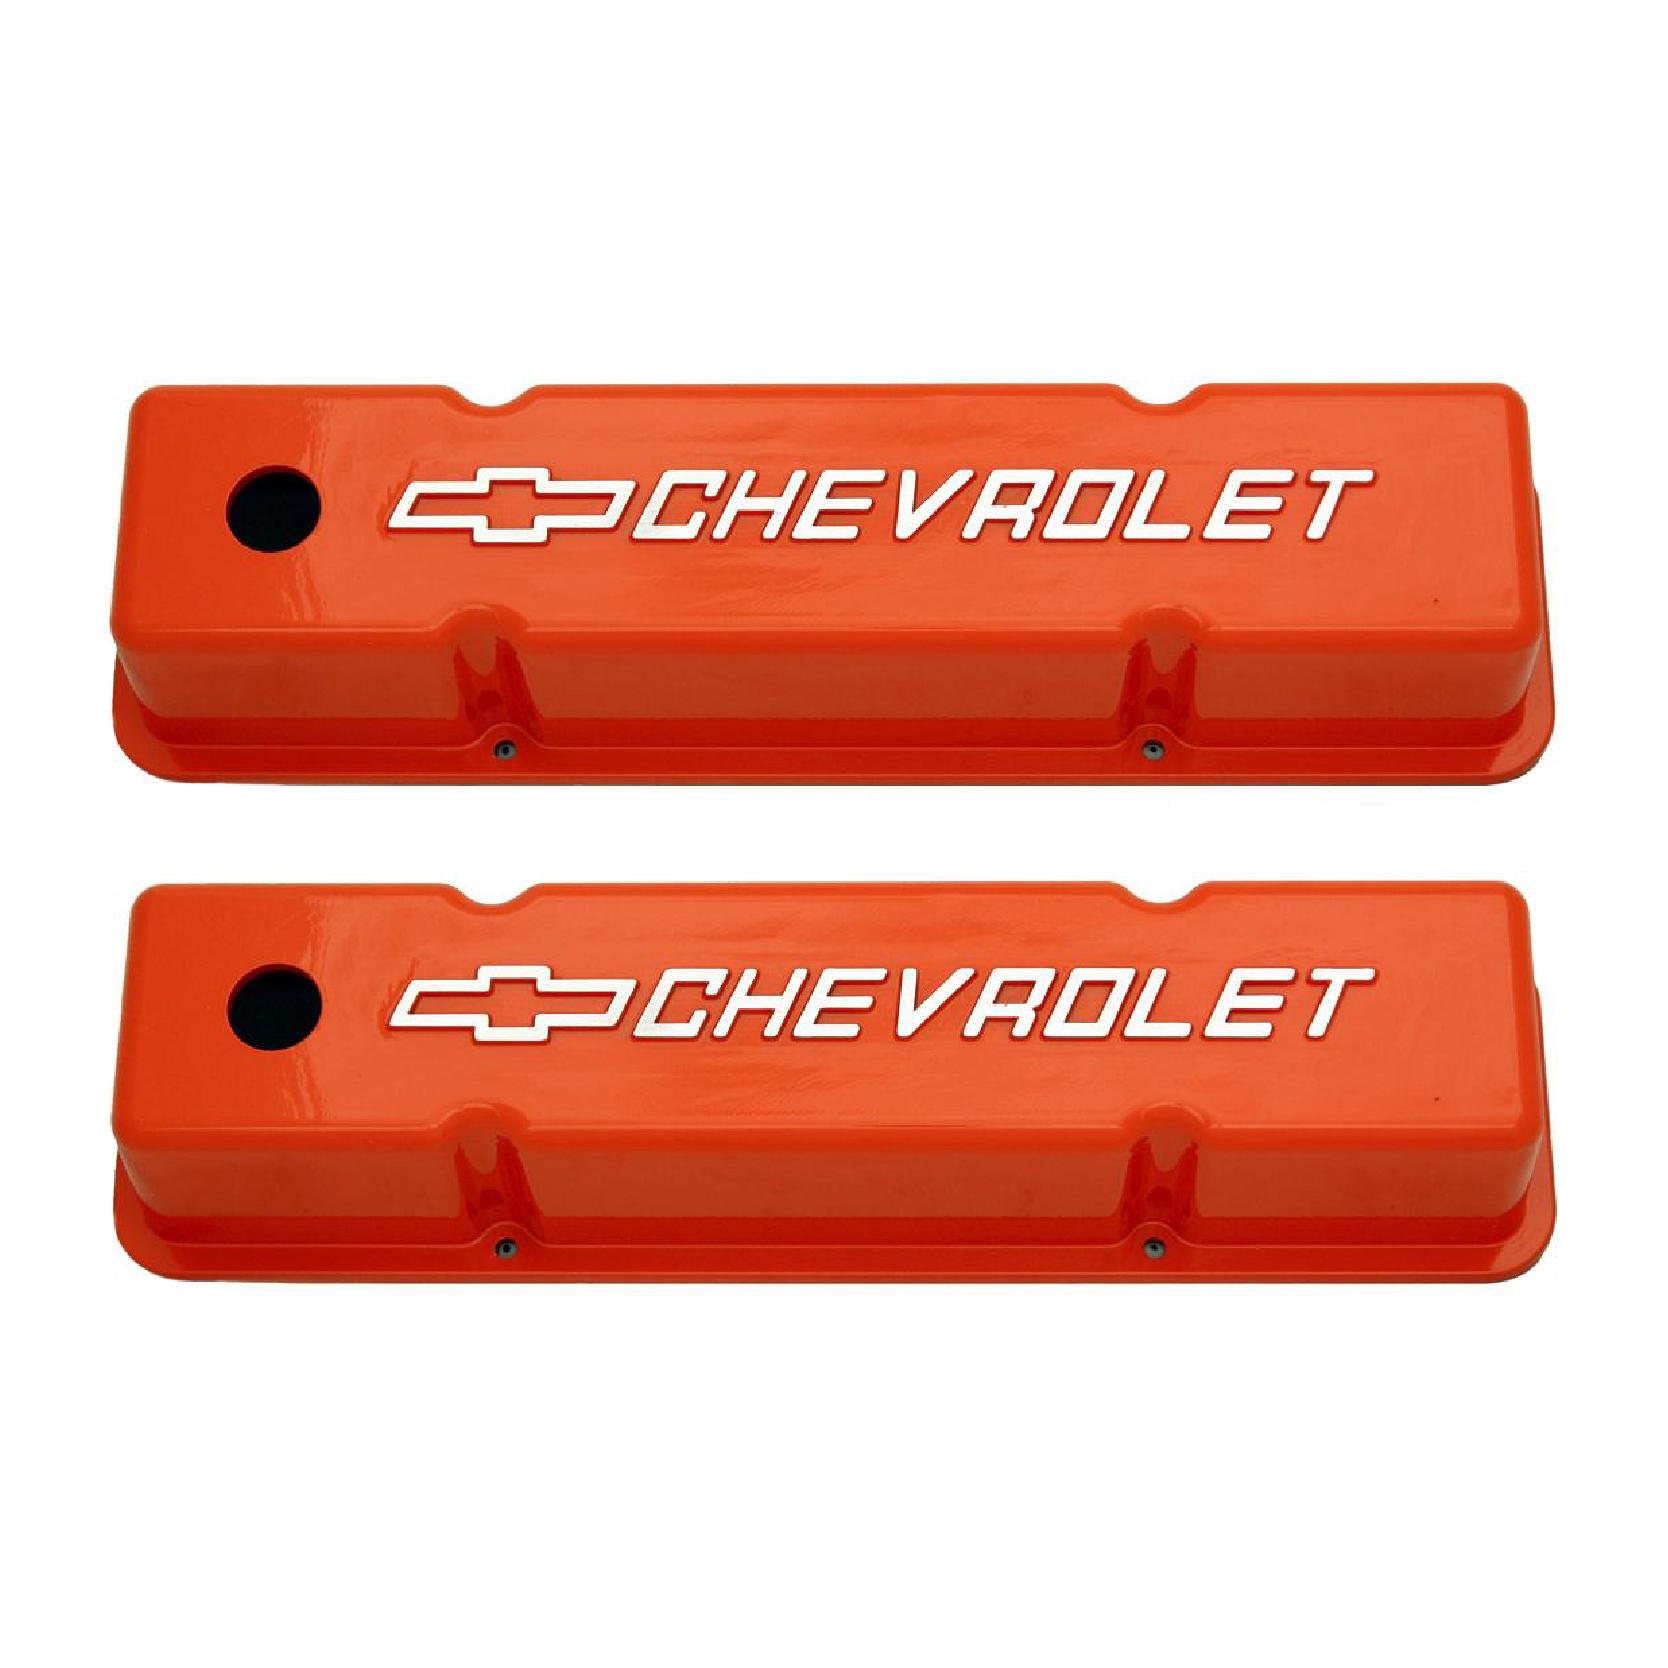 Sbc Cast Aluminum Valve Covers W Chevrolet Logo Racing Power Company